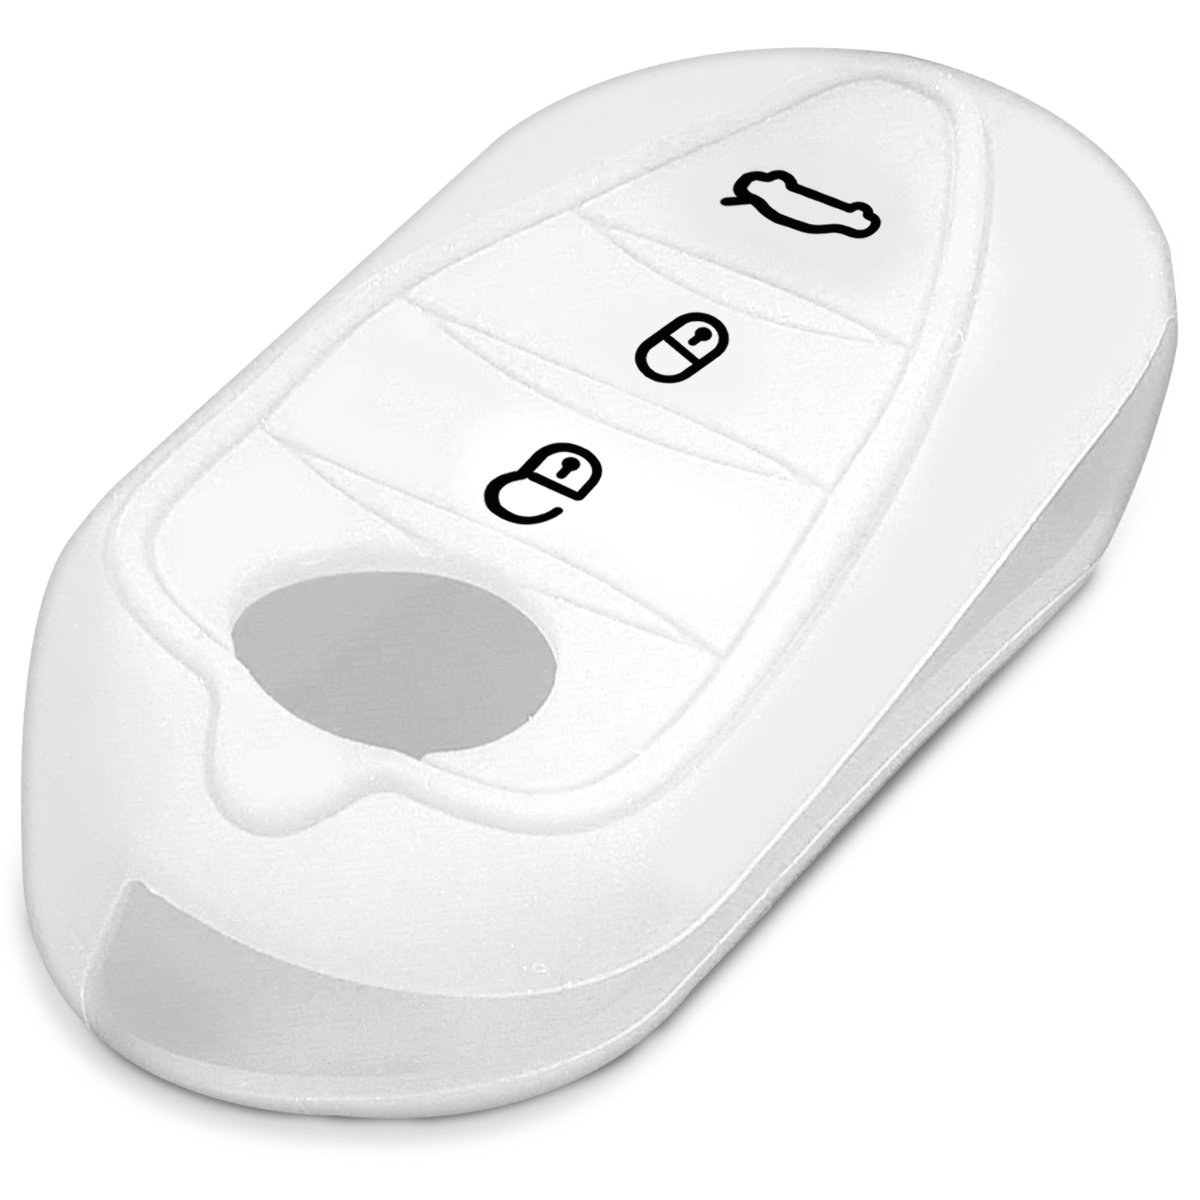 Silicone Protective Key Fob Cover for Alfa Romeo 3 Button Car Flip Key White kwmobile Car Key Cover for Alfa Romeo